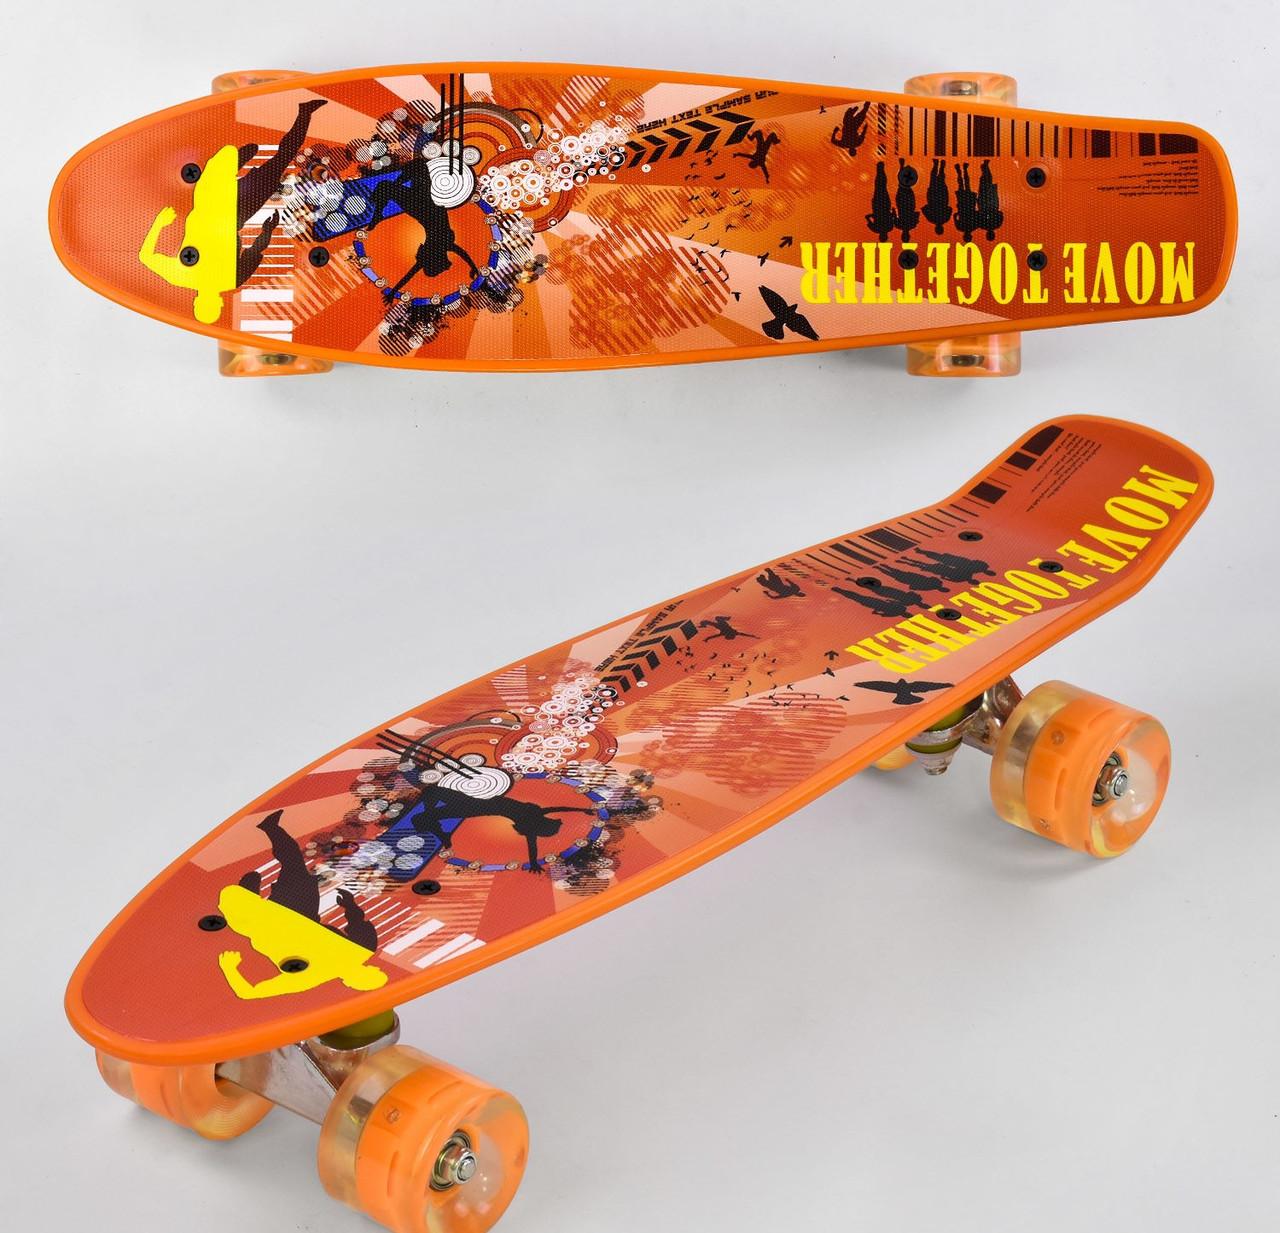 Скейт Best Board Р 13222, дошка 55 см, колеса PU, світяться